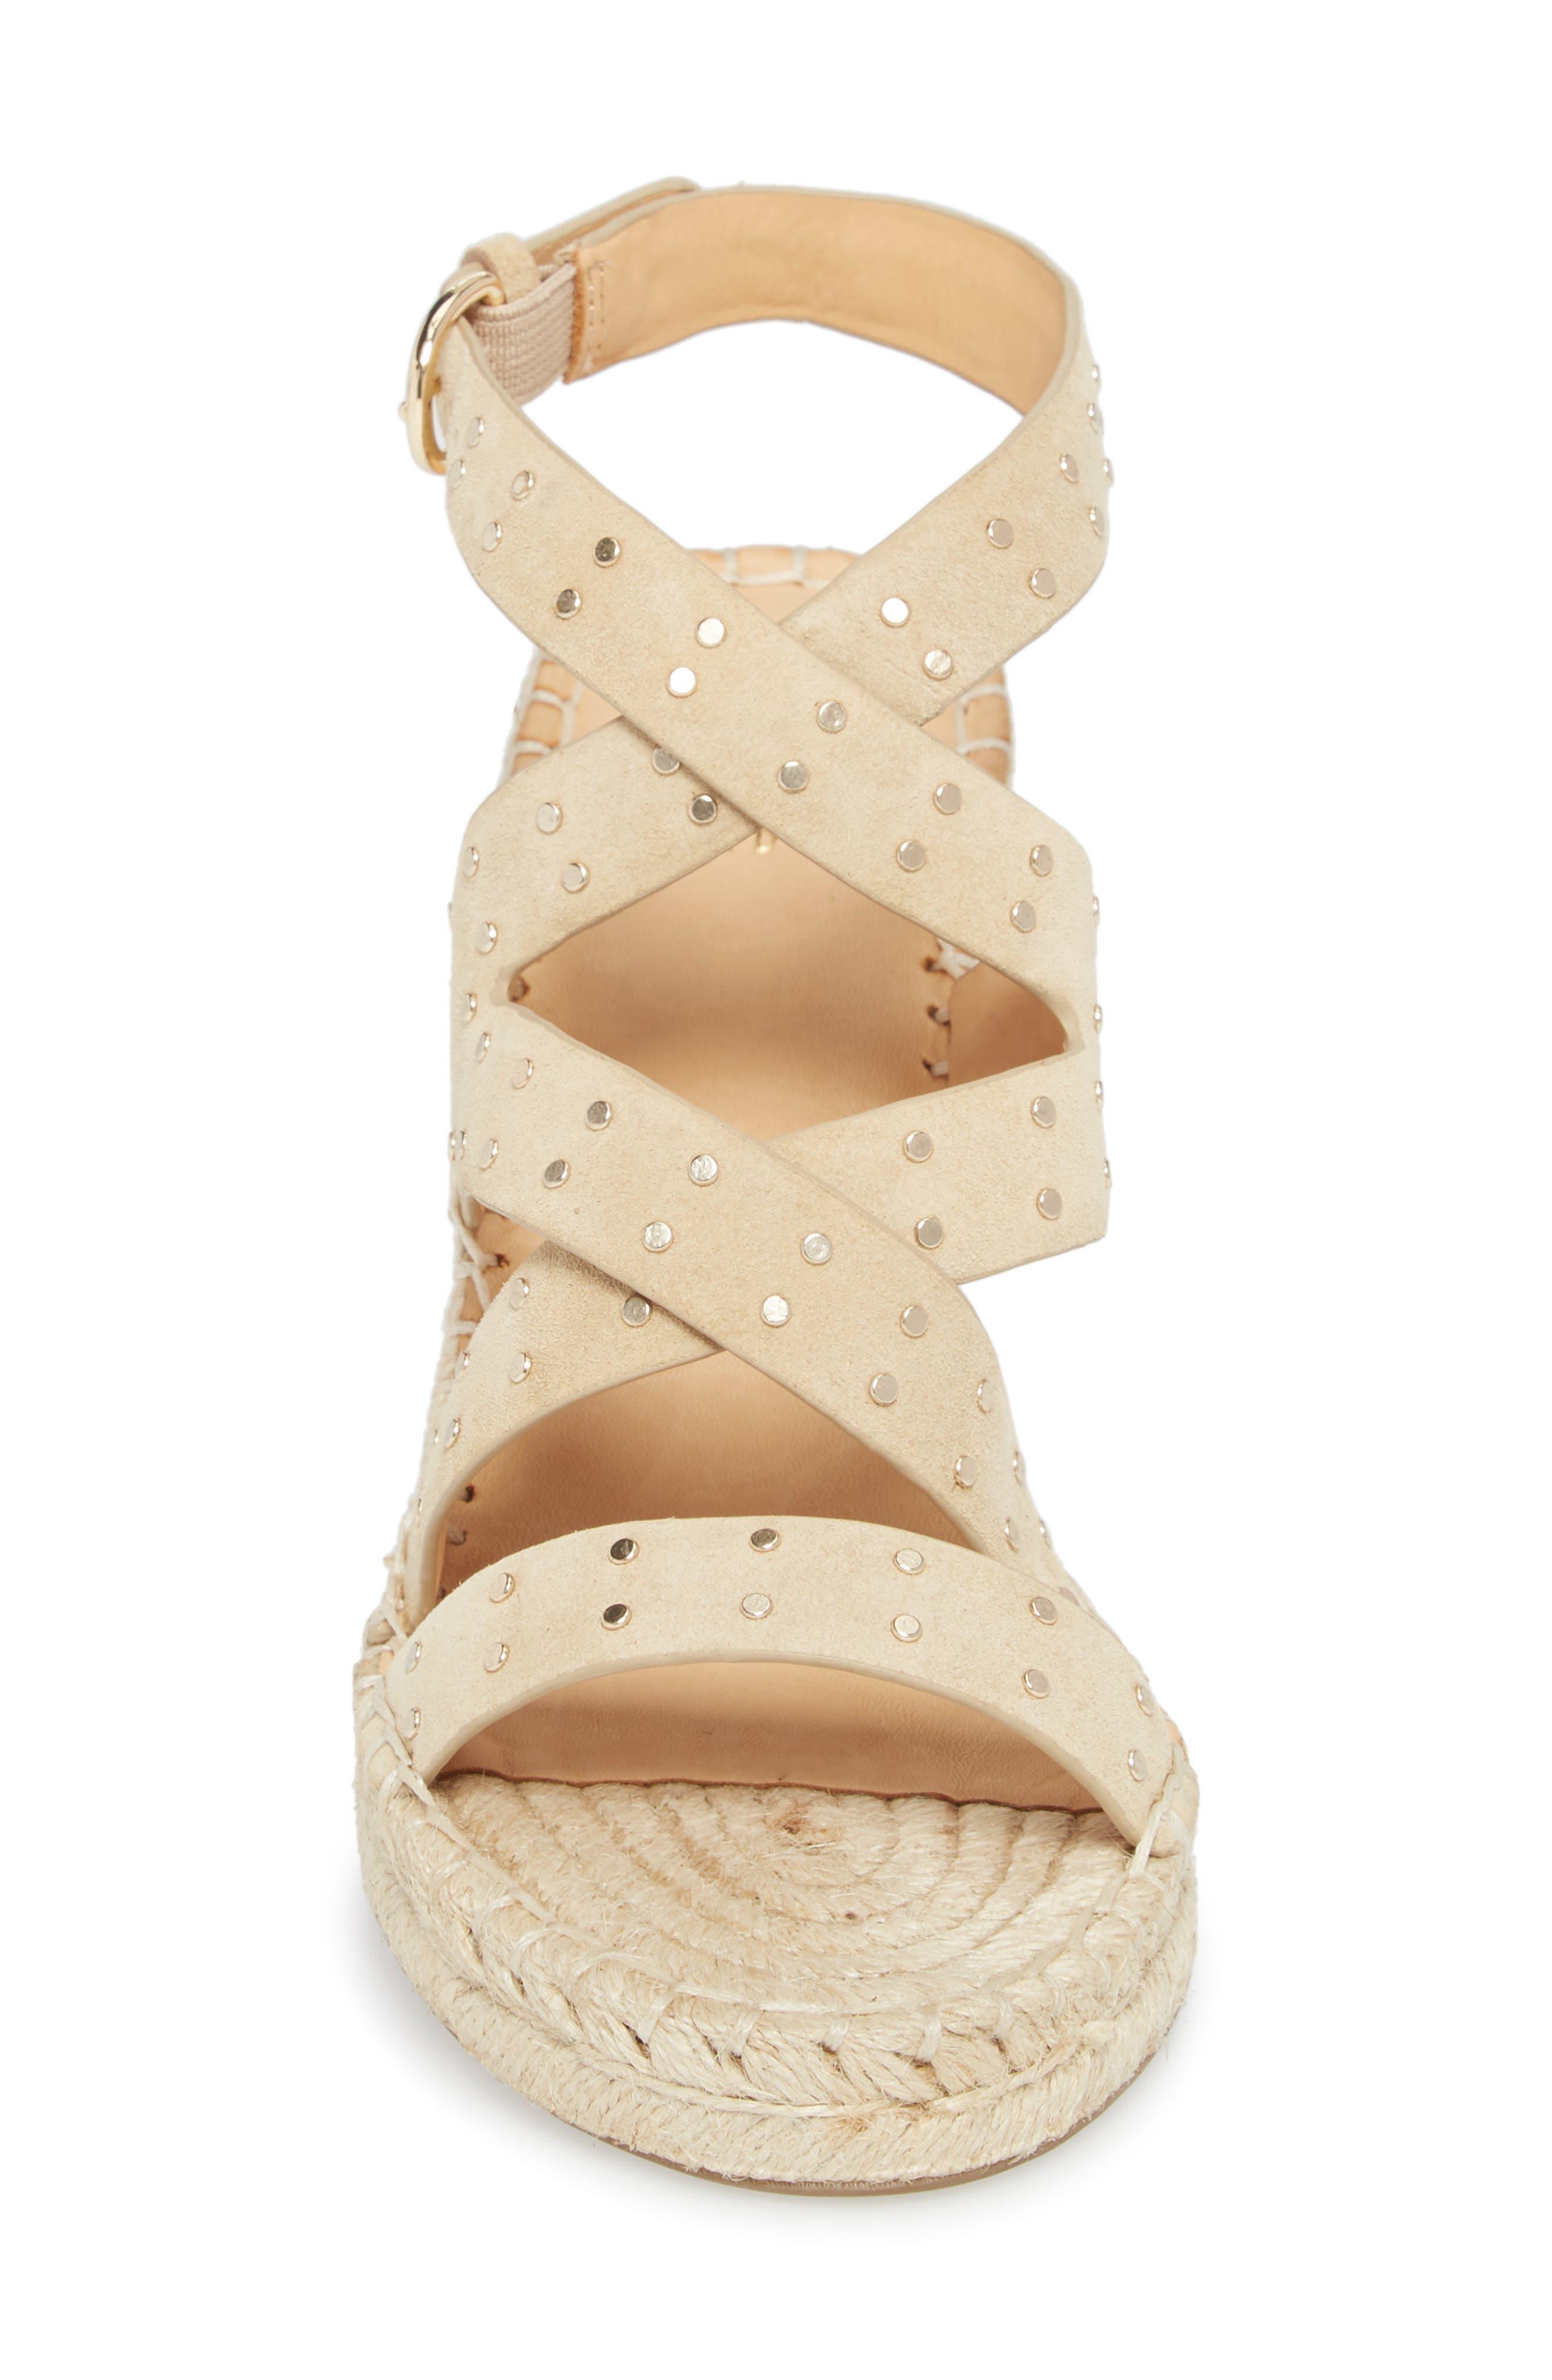 Korat Studded Wedge Espadrille Sandal,                             Alternate thumbnail 4, color,                             SAND